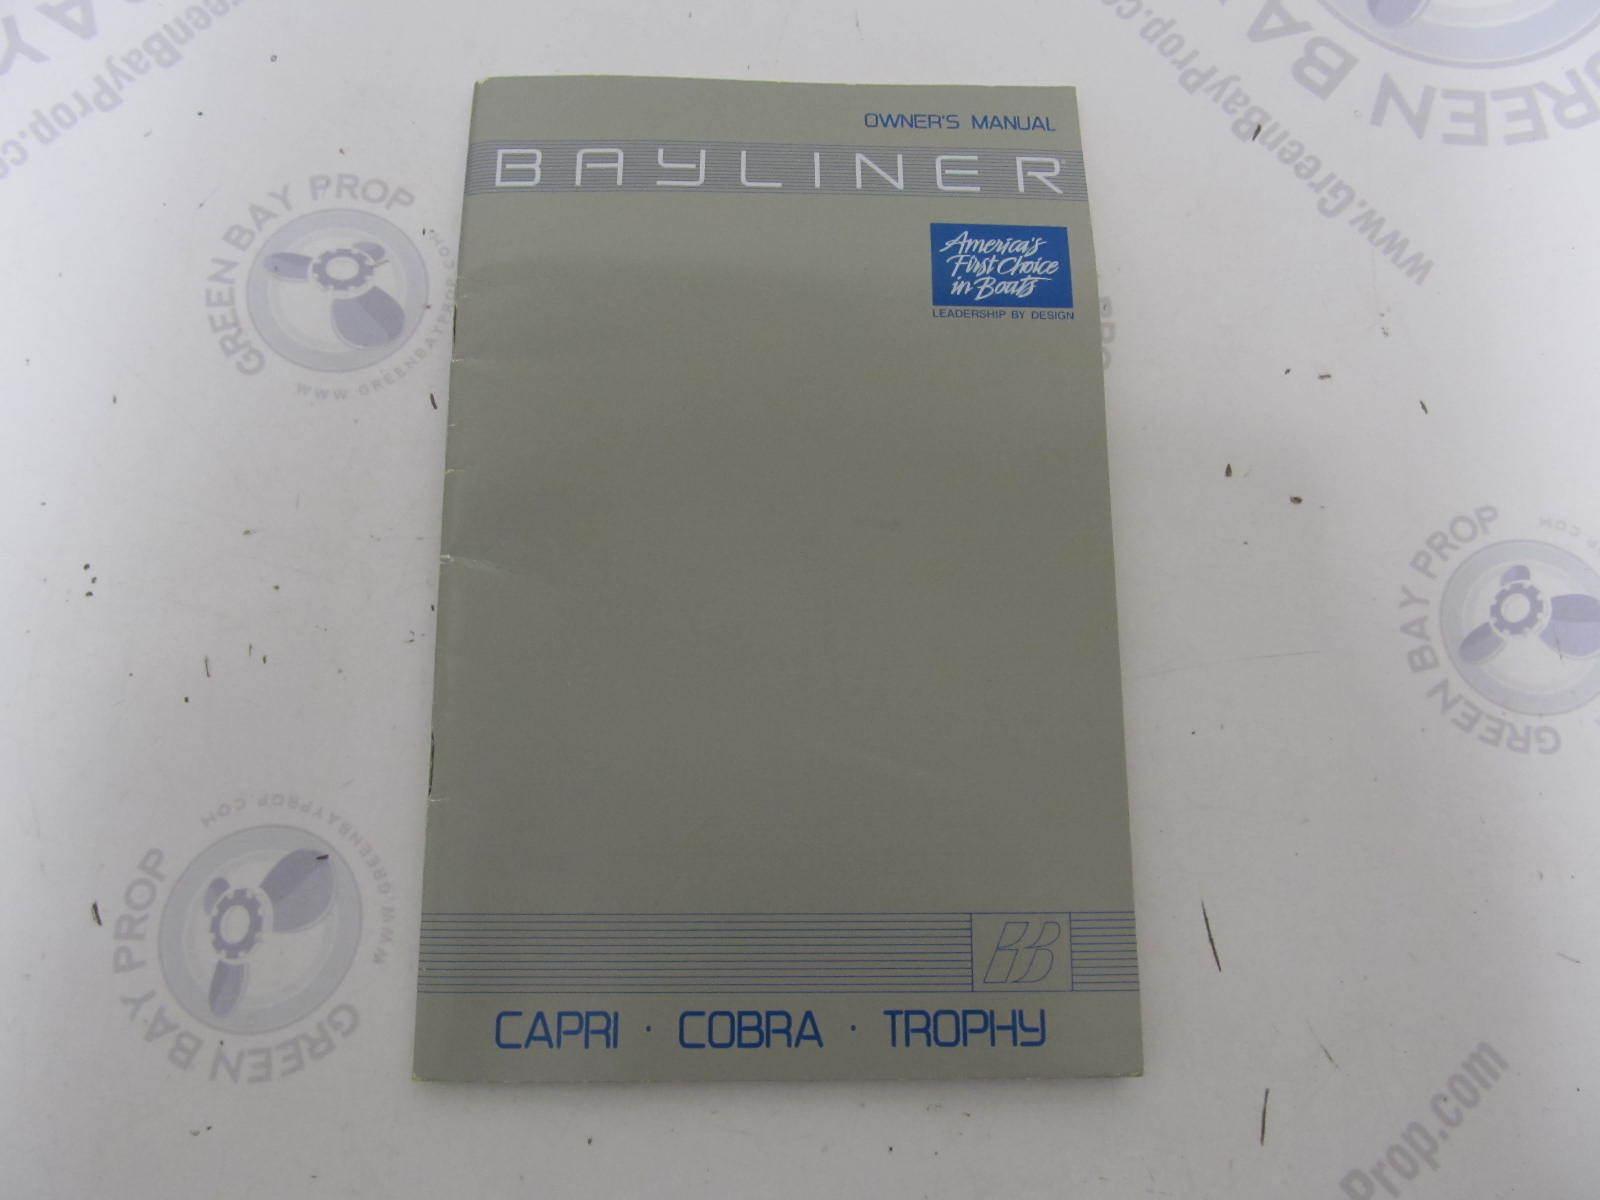 1998 Bayliner Ciera Owners Manua Ecat Can Operate Off Of Power Grid Rossi Cold Fusion Array 1988 Capri Manual Wiring Diagram U2022 Rh 45 32